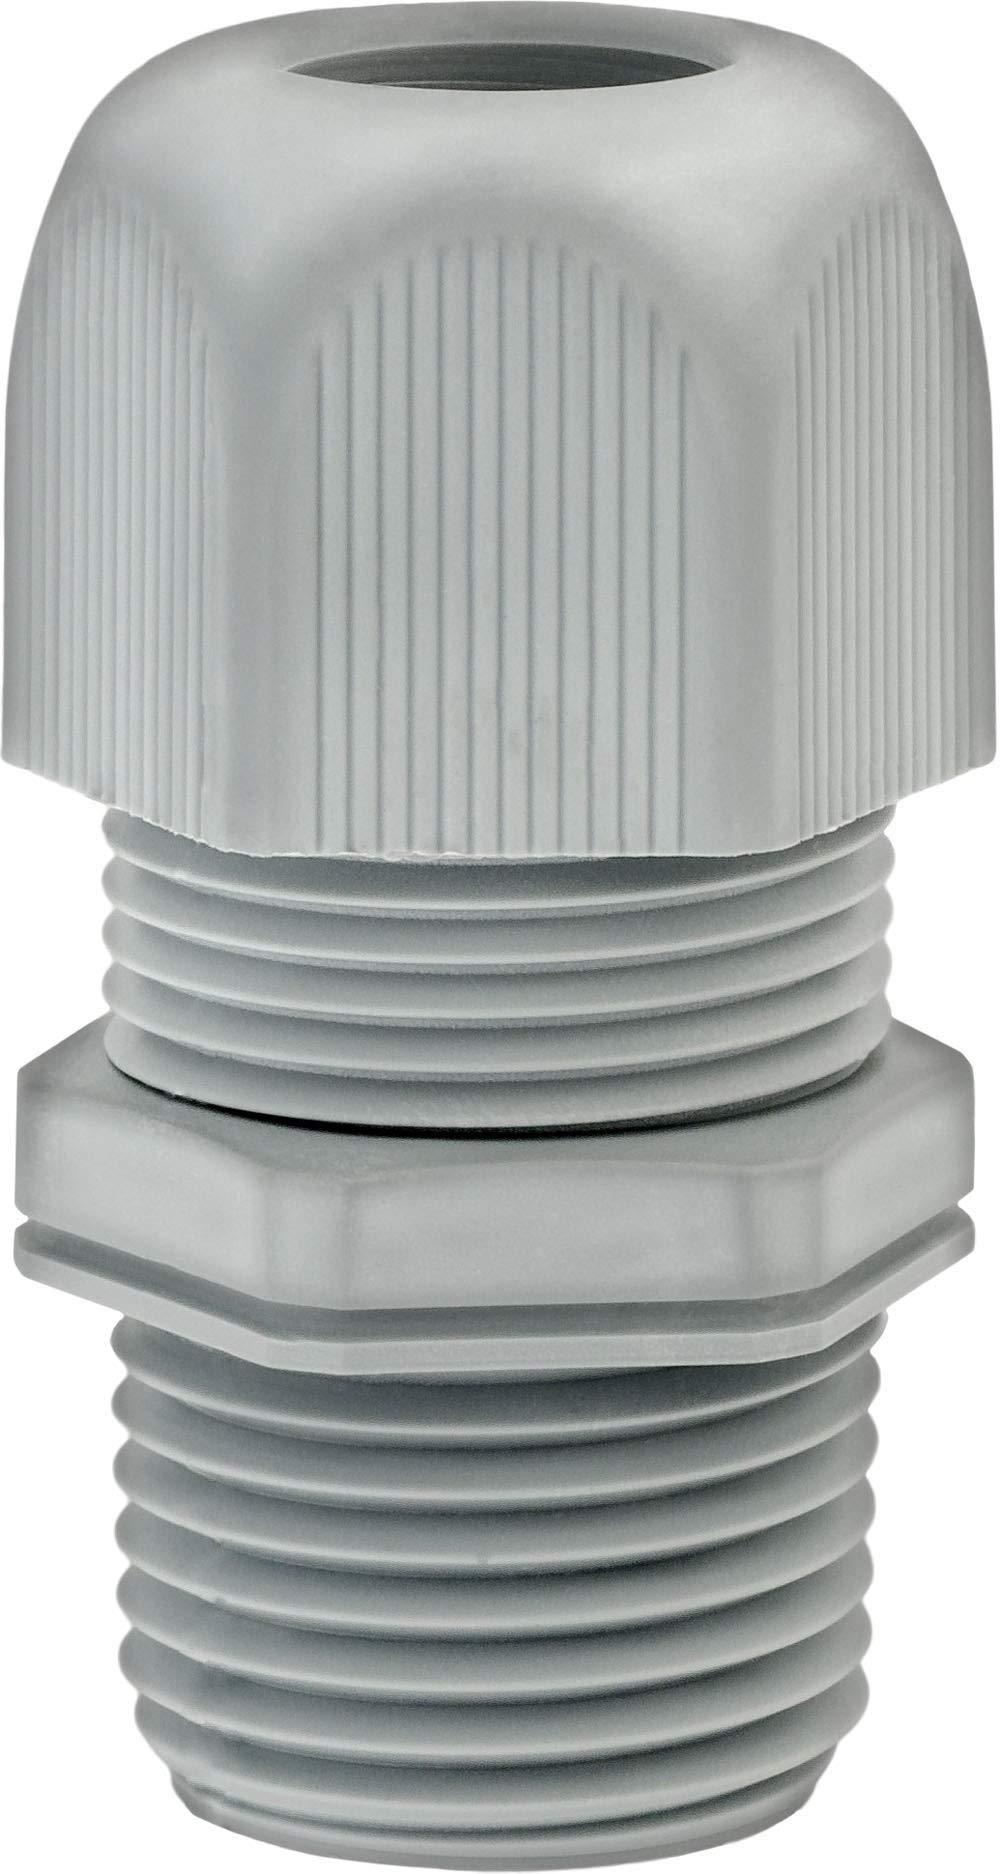 Clipsandfasteners Inc Strain Relief Cord Connector 1/2 Thread by Clipsandfasteners Inc